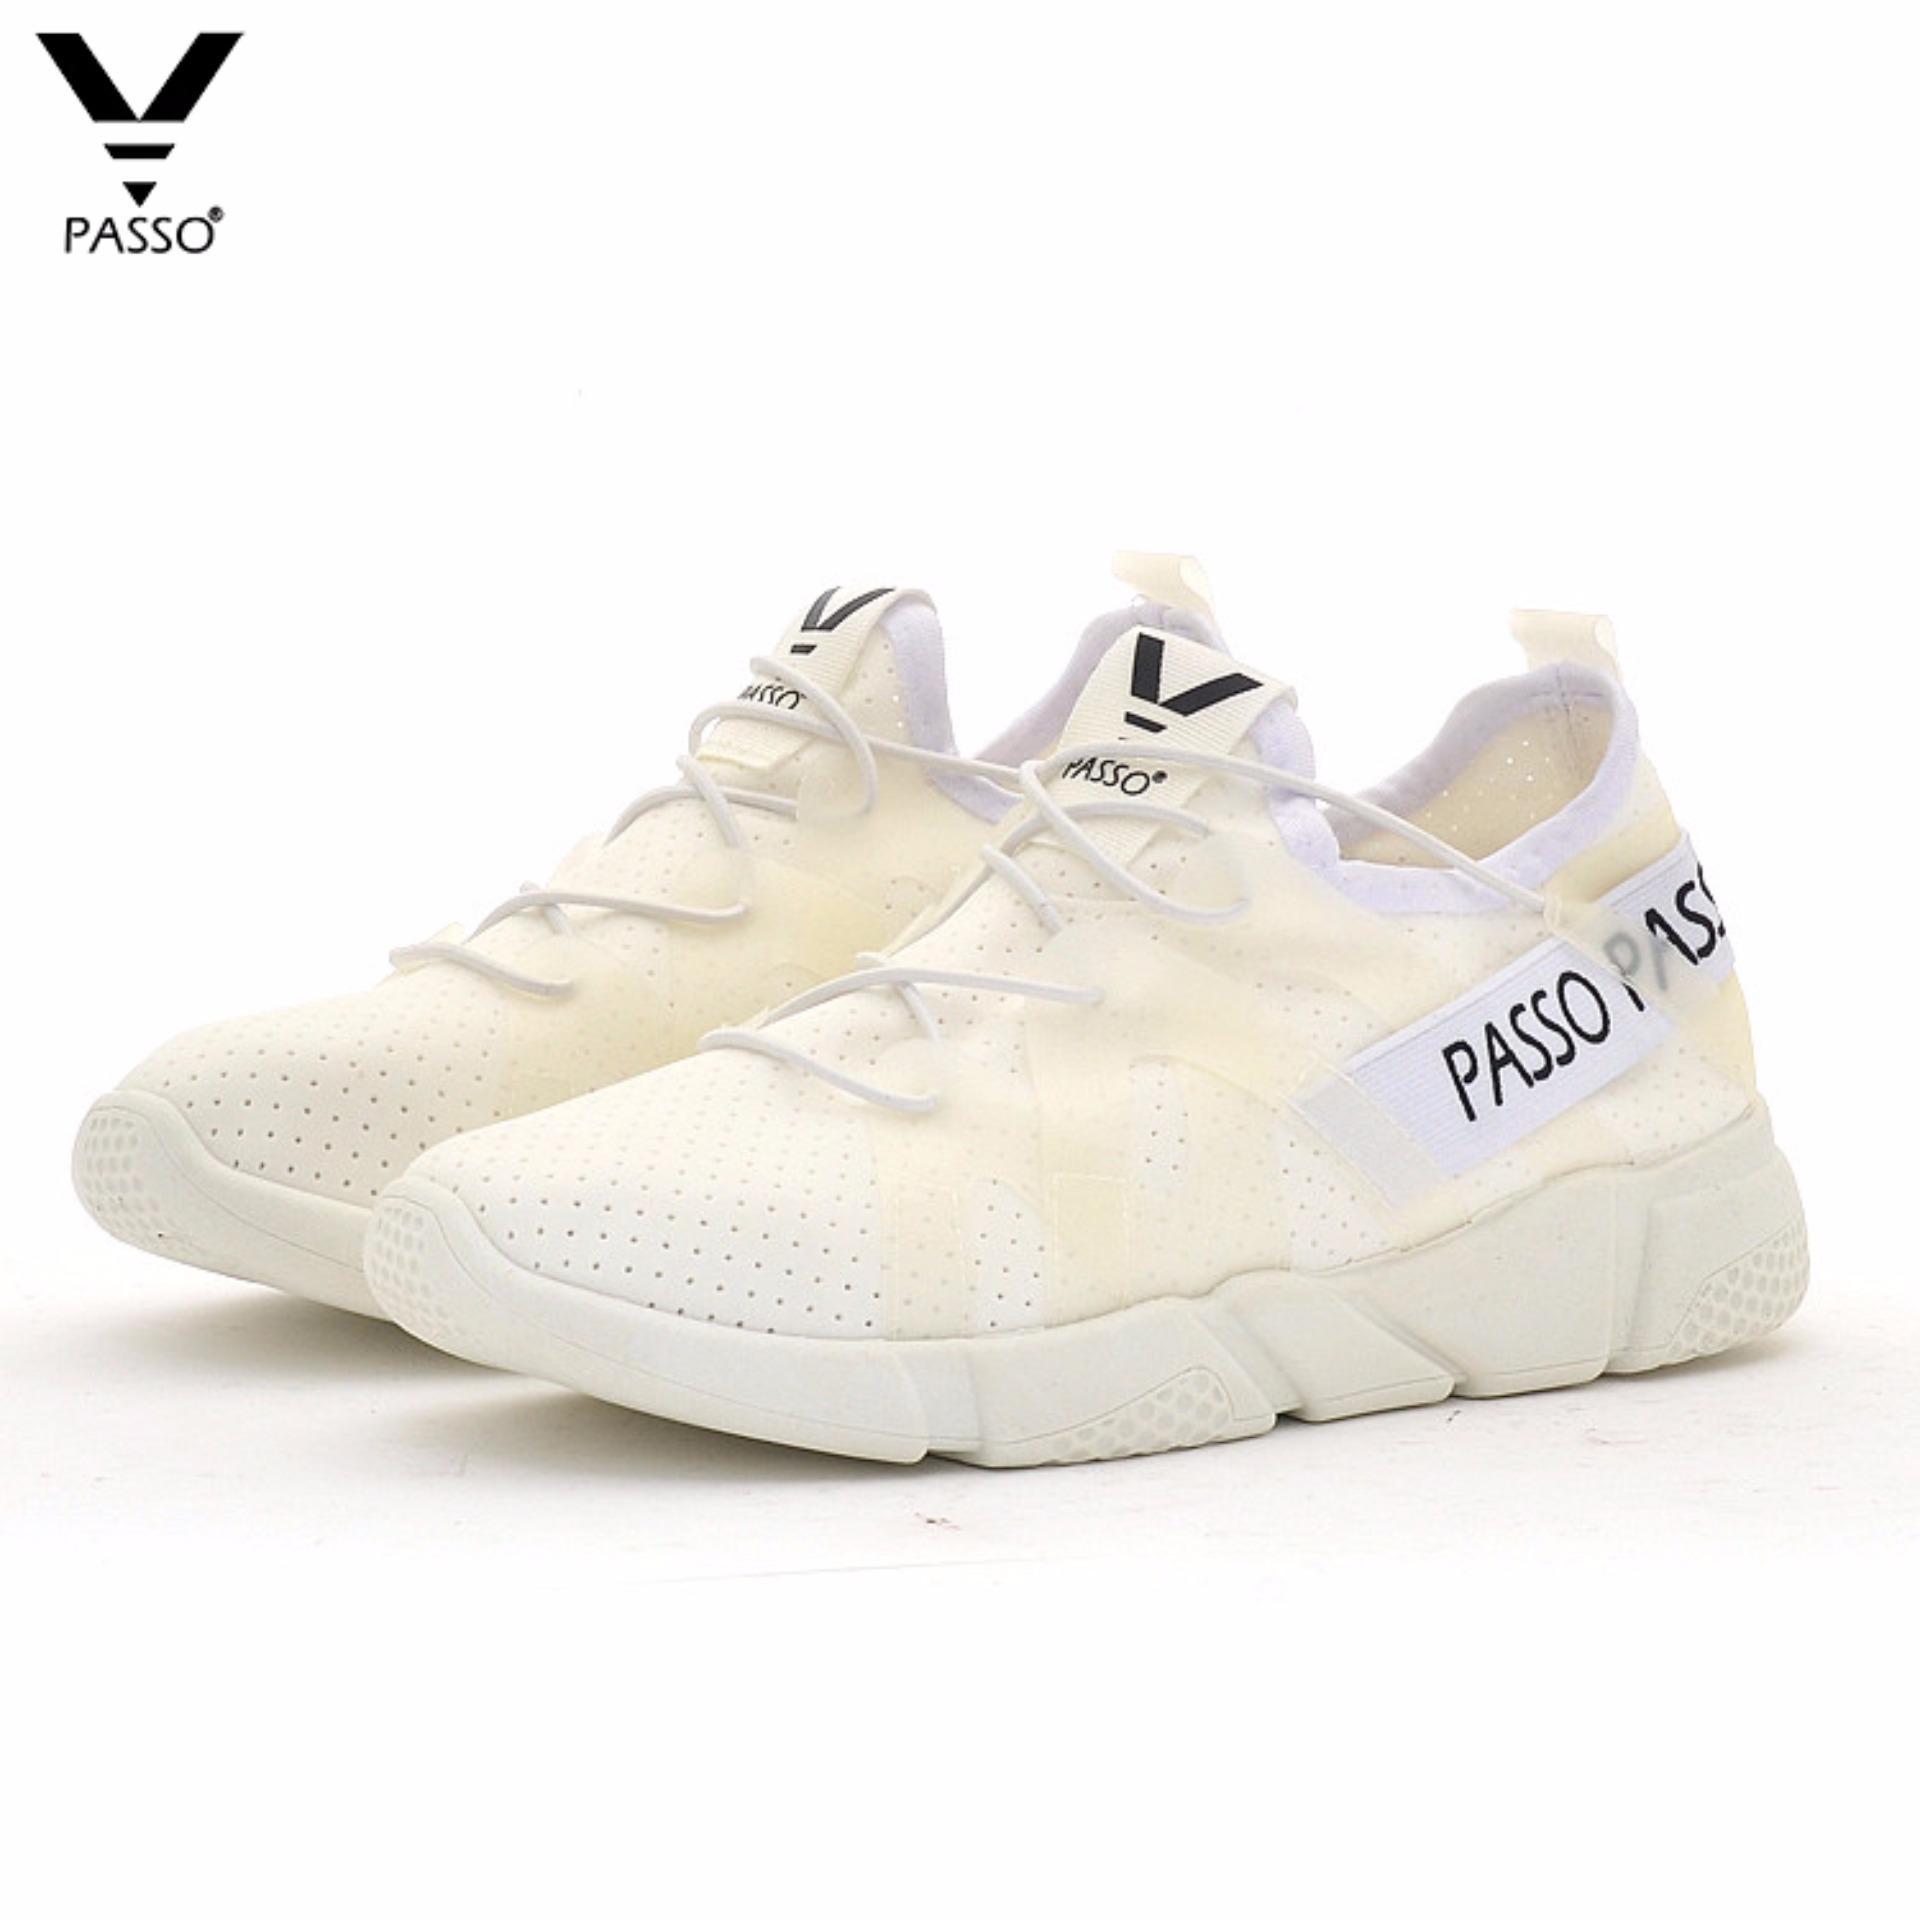 Giày Thể Thao Nữ PASSO G037 (Trắng)